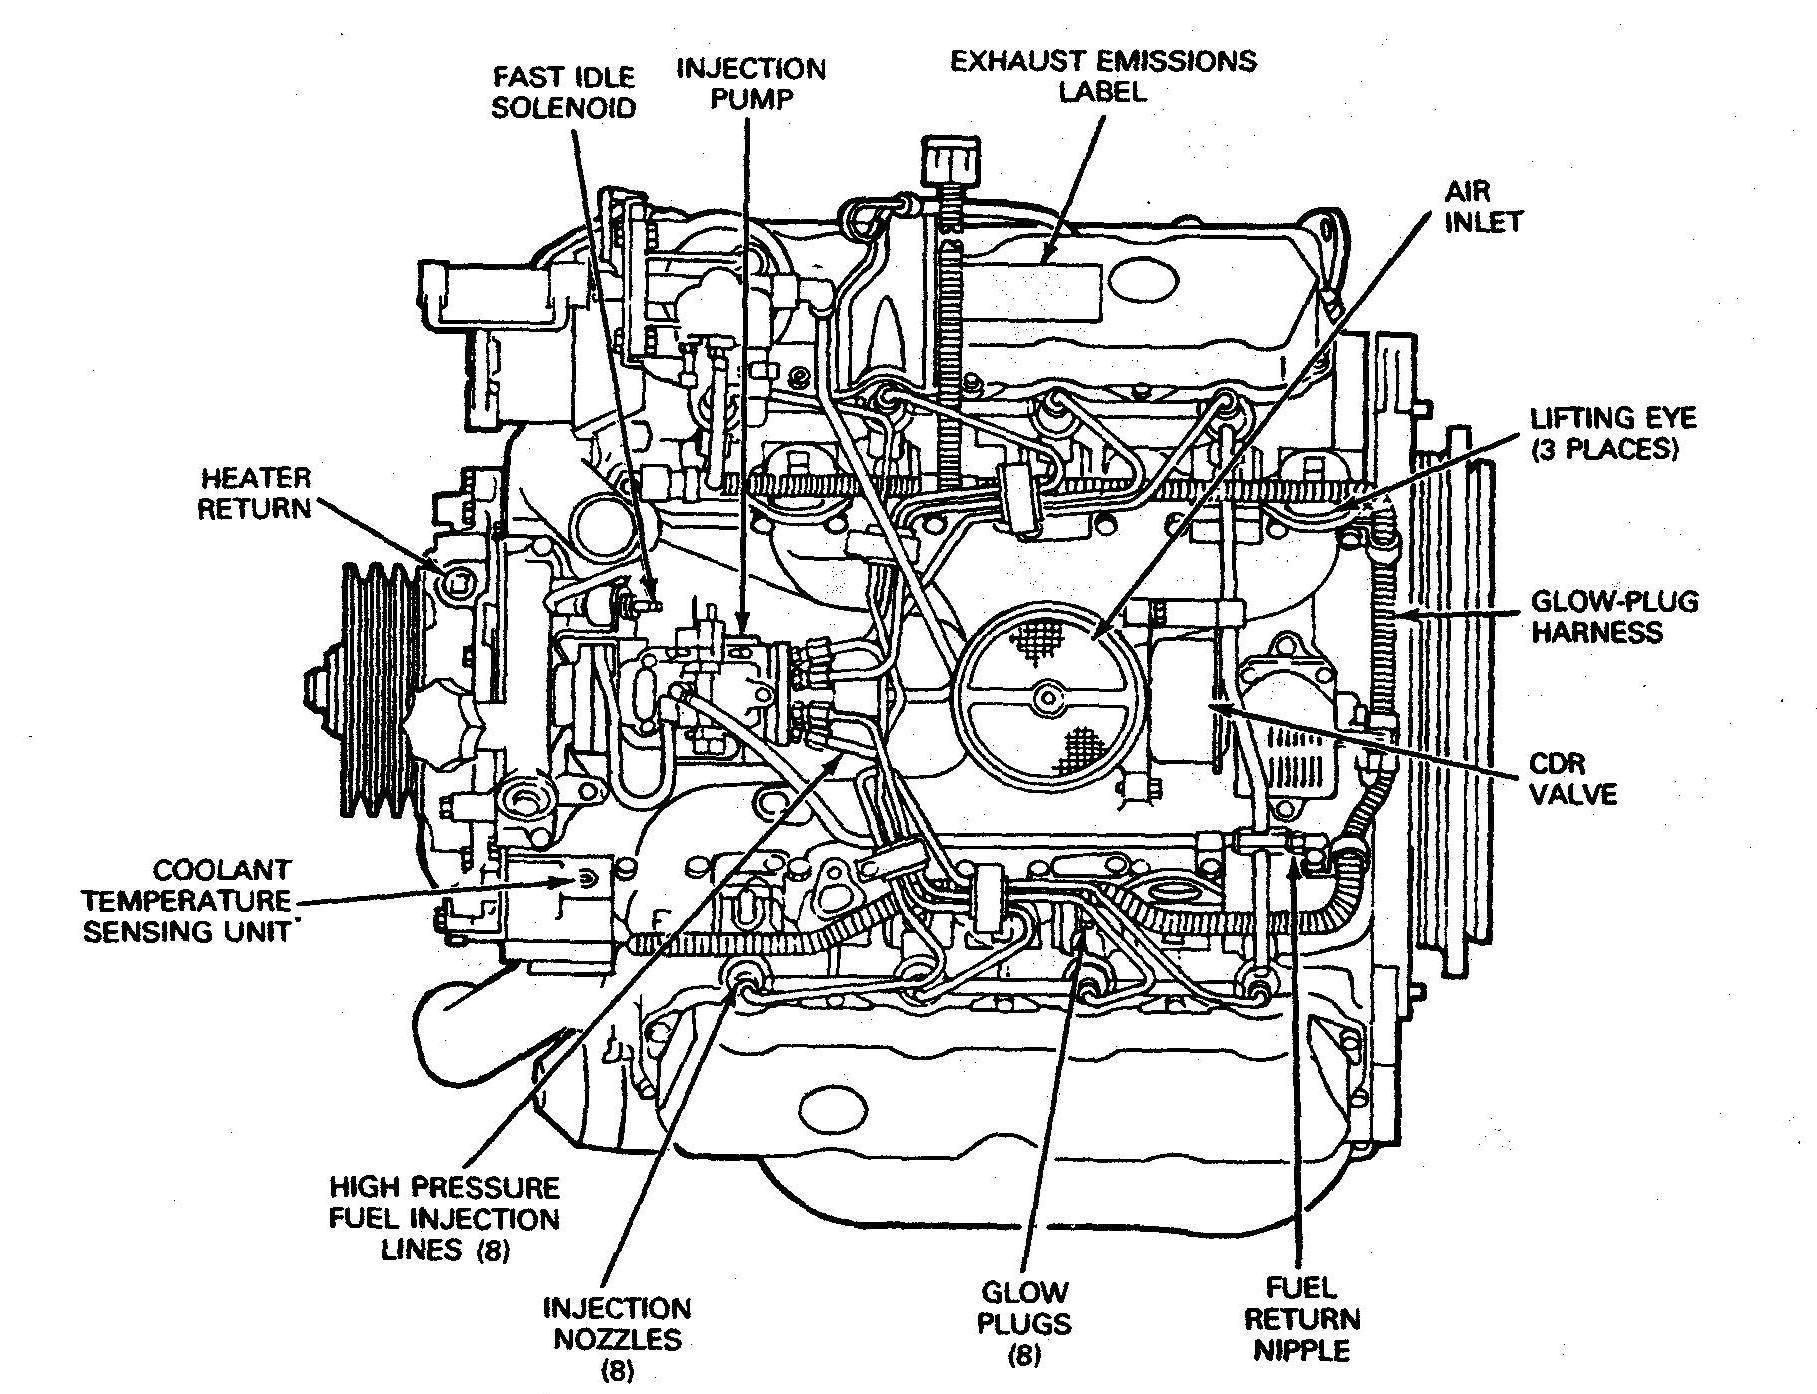 Diagram Of Rotary Engine Automotive Engine Diagram Wiring Diagrams Of Diagram Of Rotary Engine